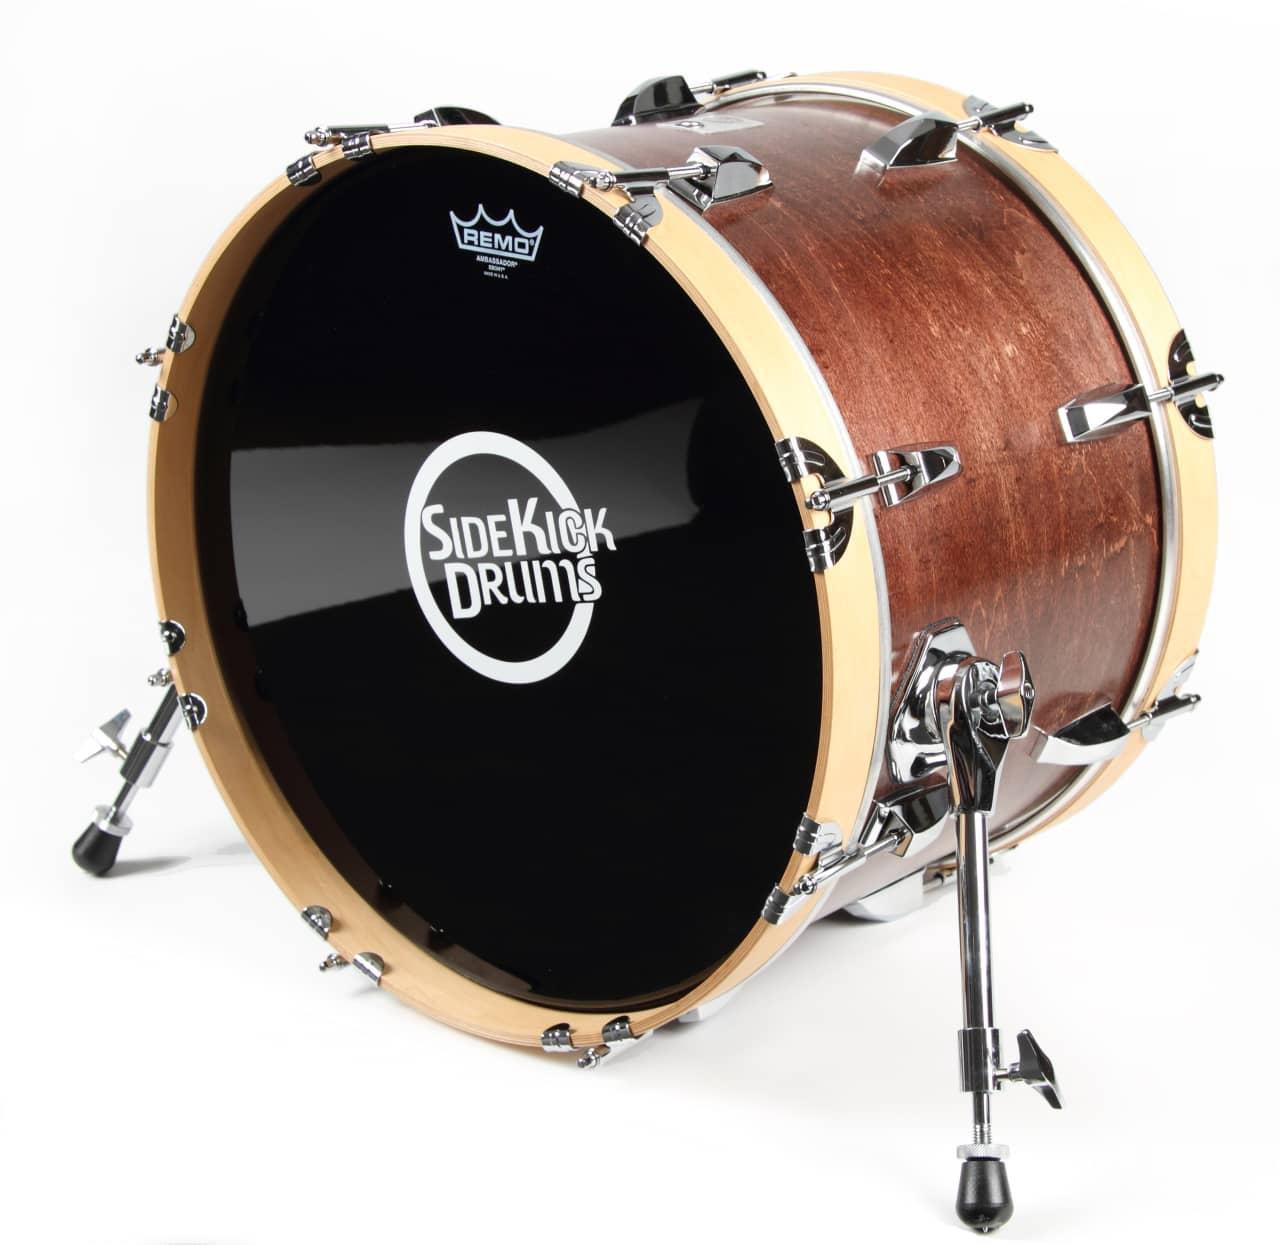 side kick drums travel bass drum 12 x18 2017 red reverb. Black Bedroom Furniture Sets. Home Design Ideas